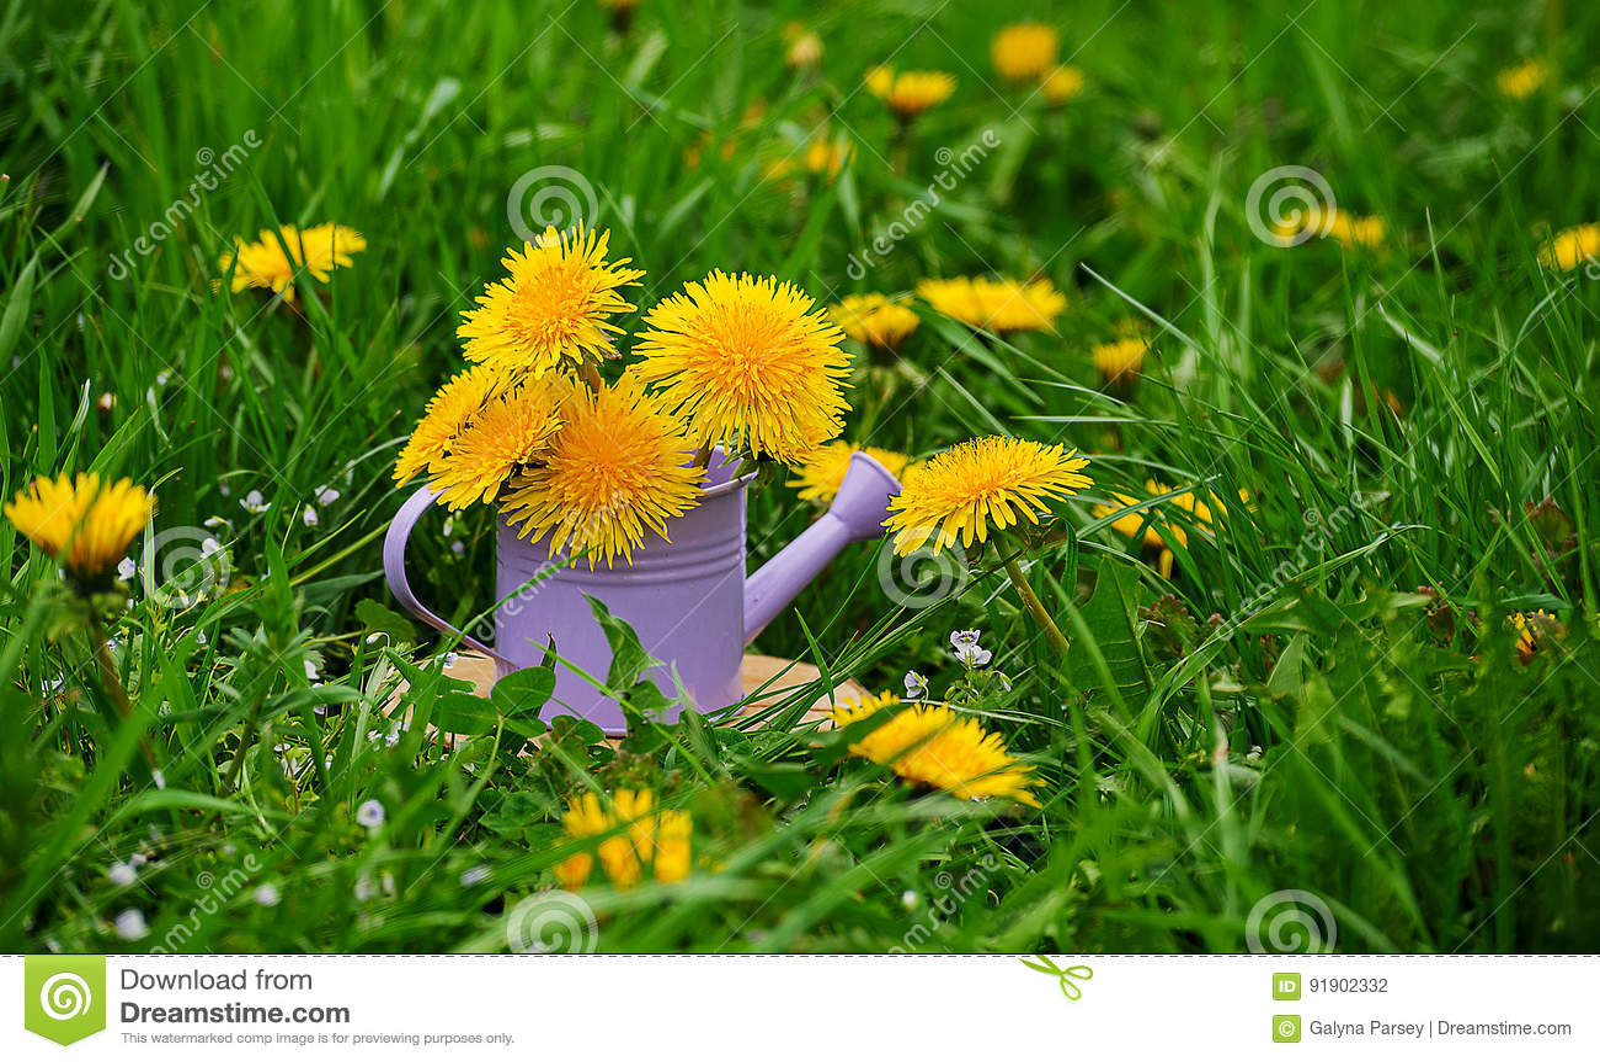 how to grow dandelions outdoors